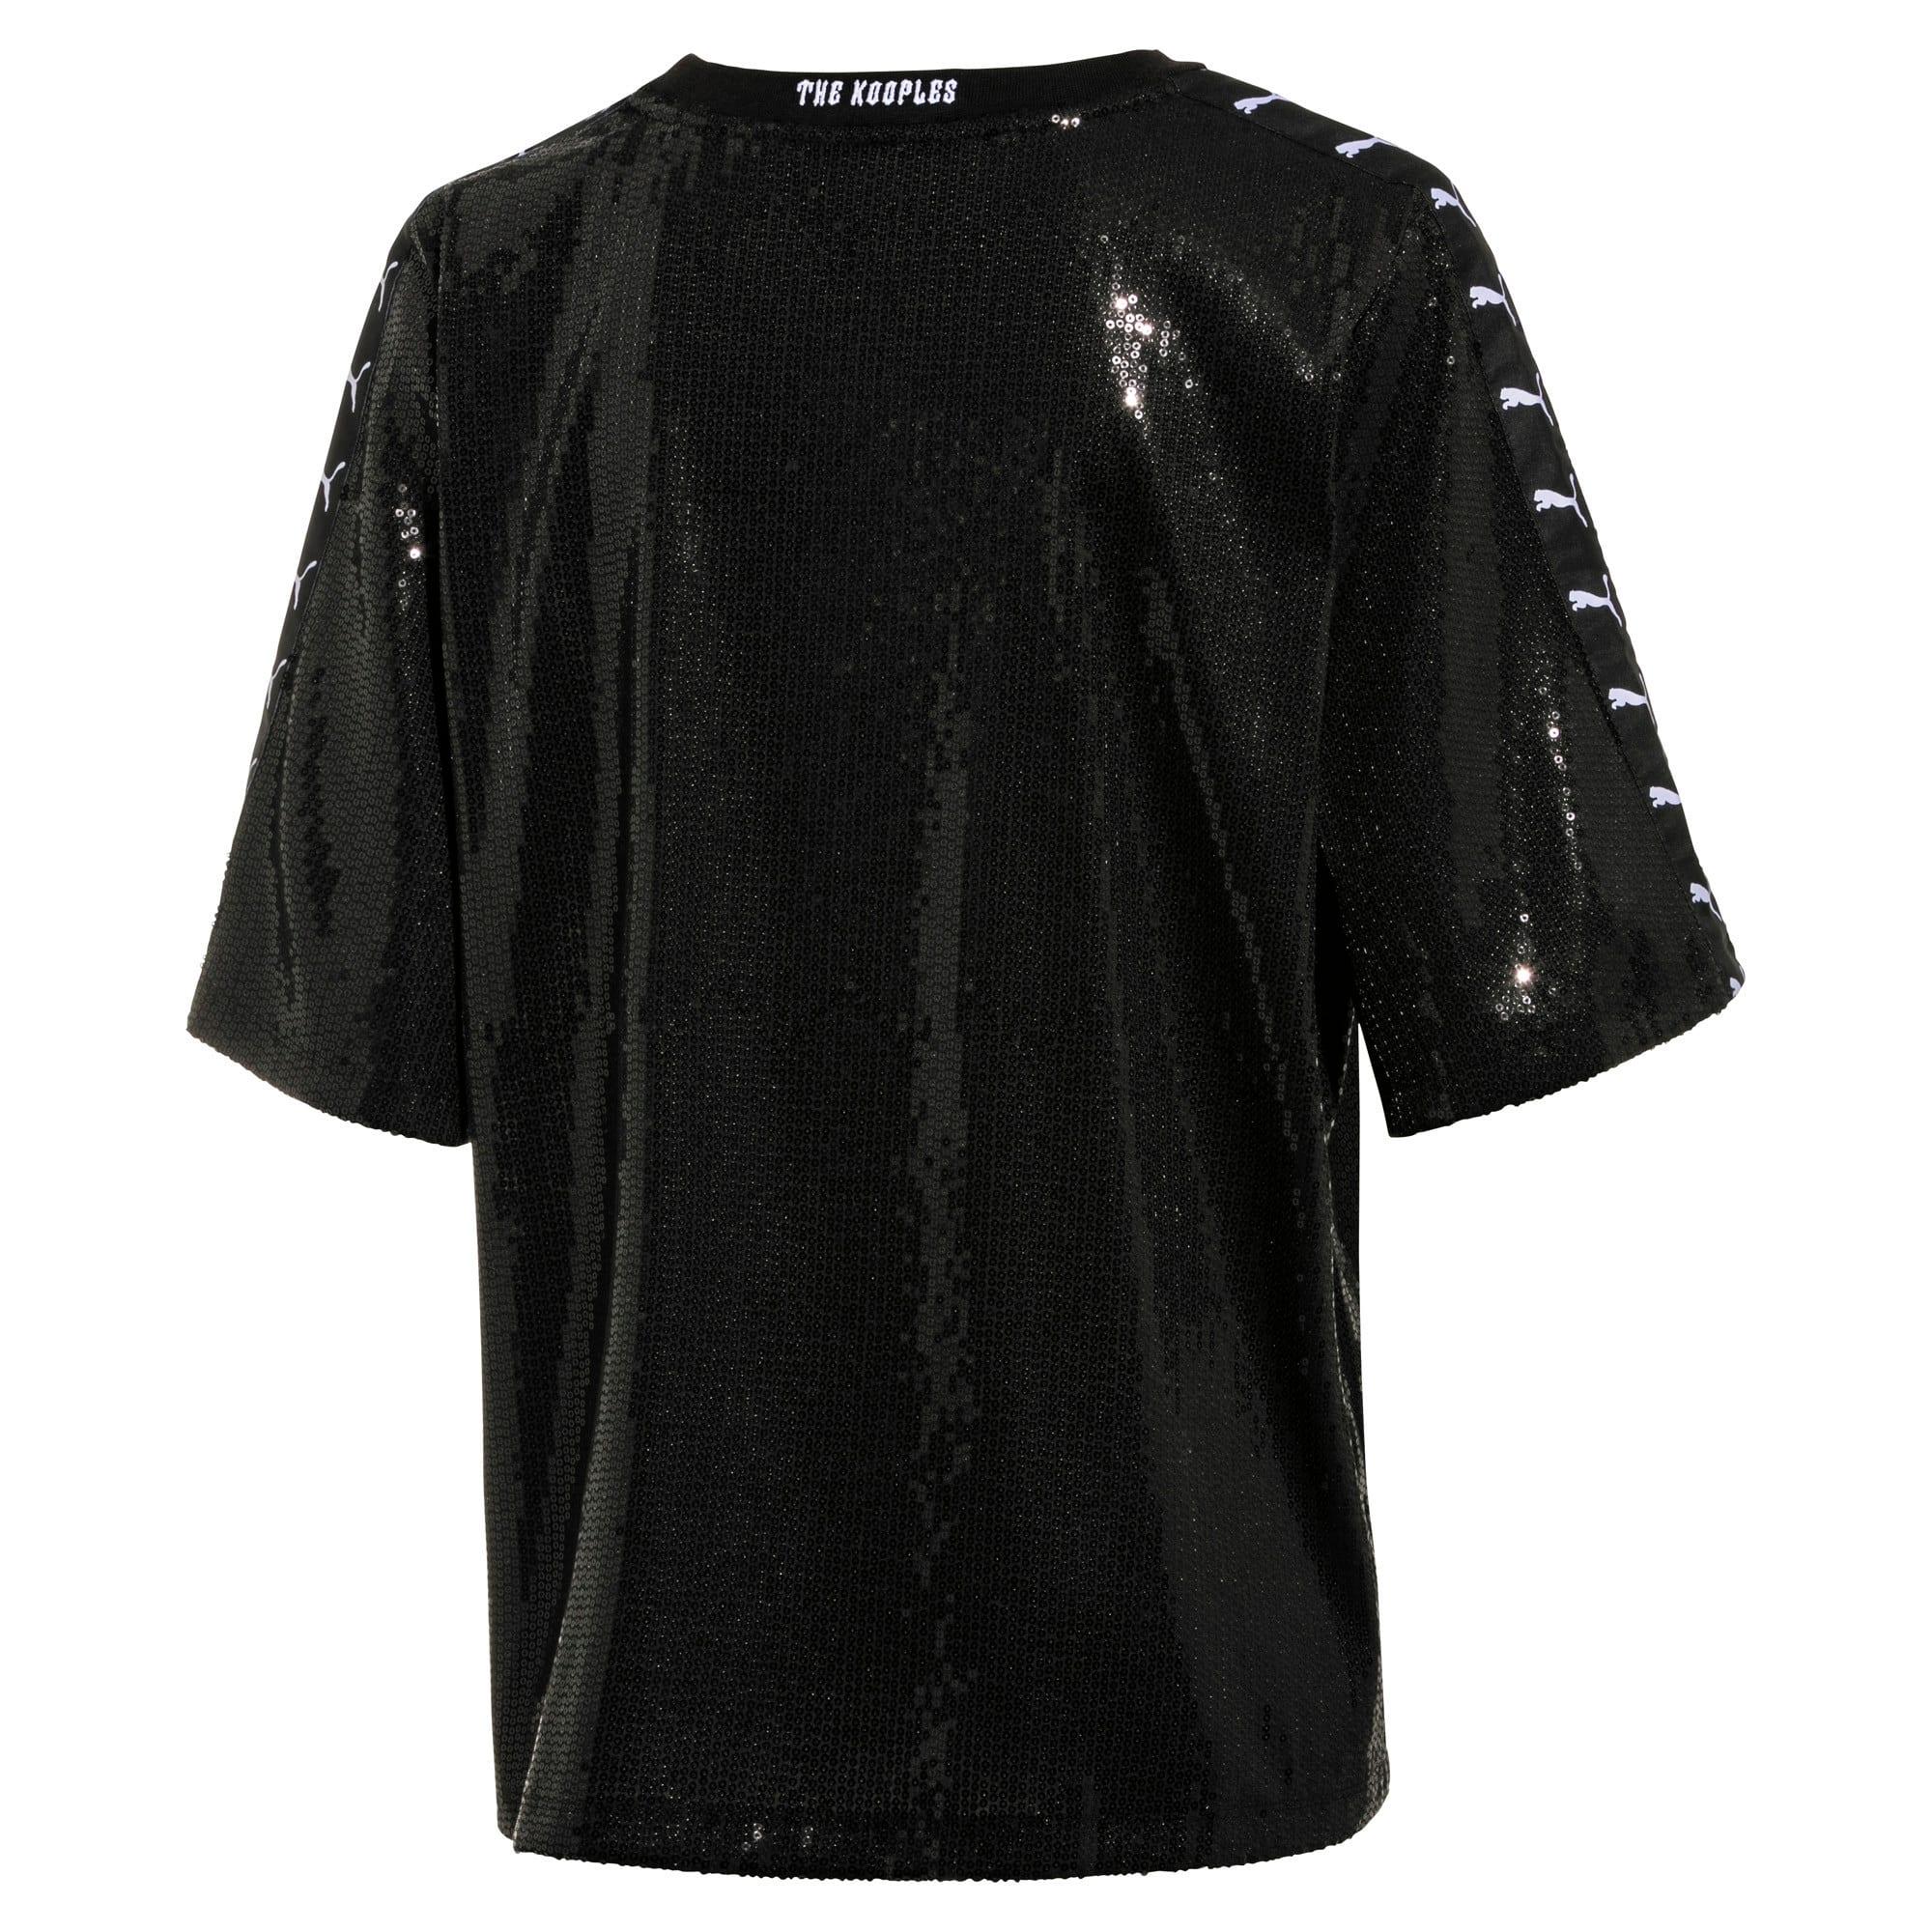 Miniatura 2 de Camiseta con lentejuelas PUMA x THE KOOPLES para mujer, Puma Black, mediano